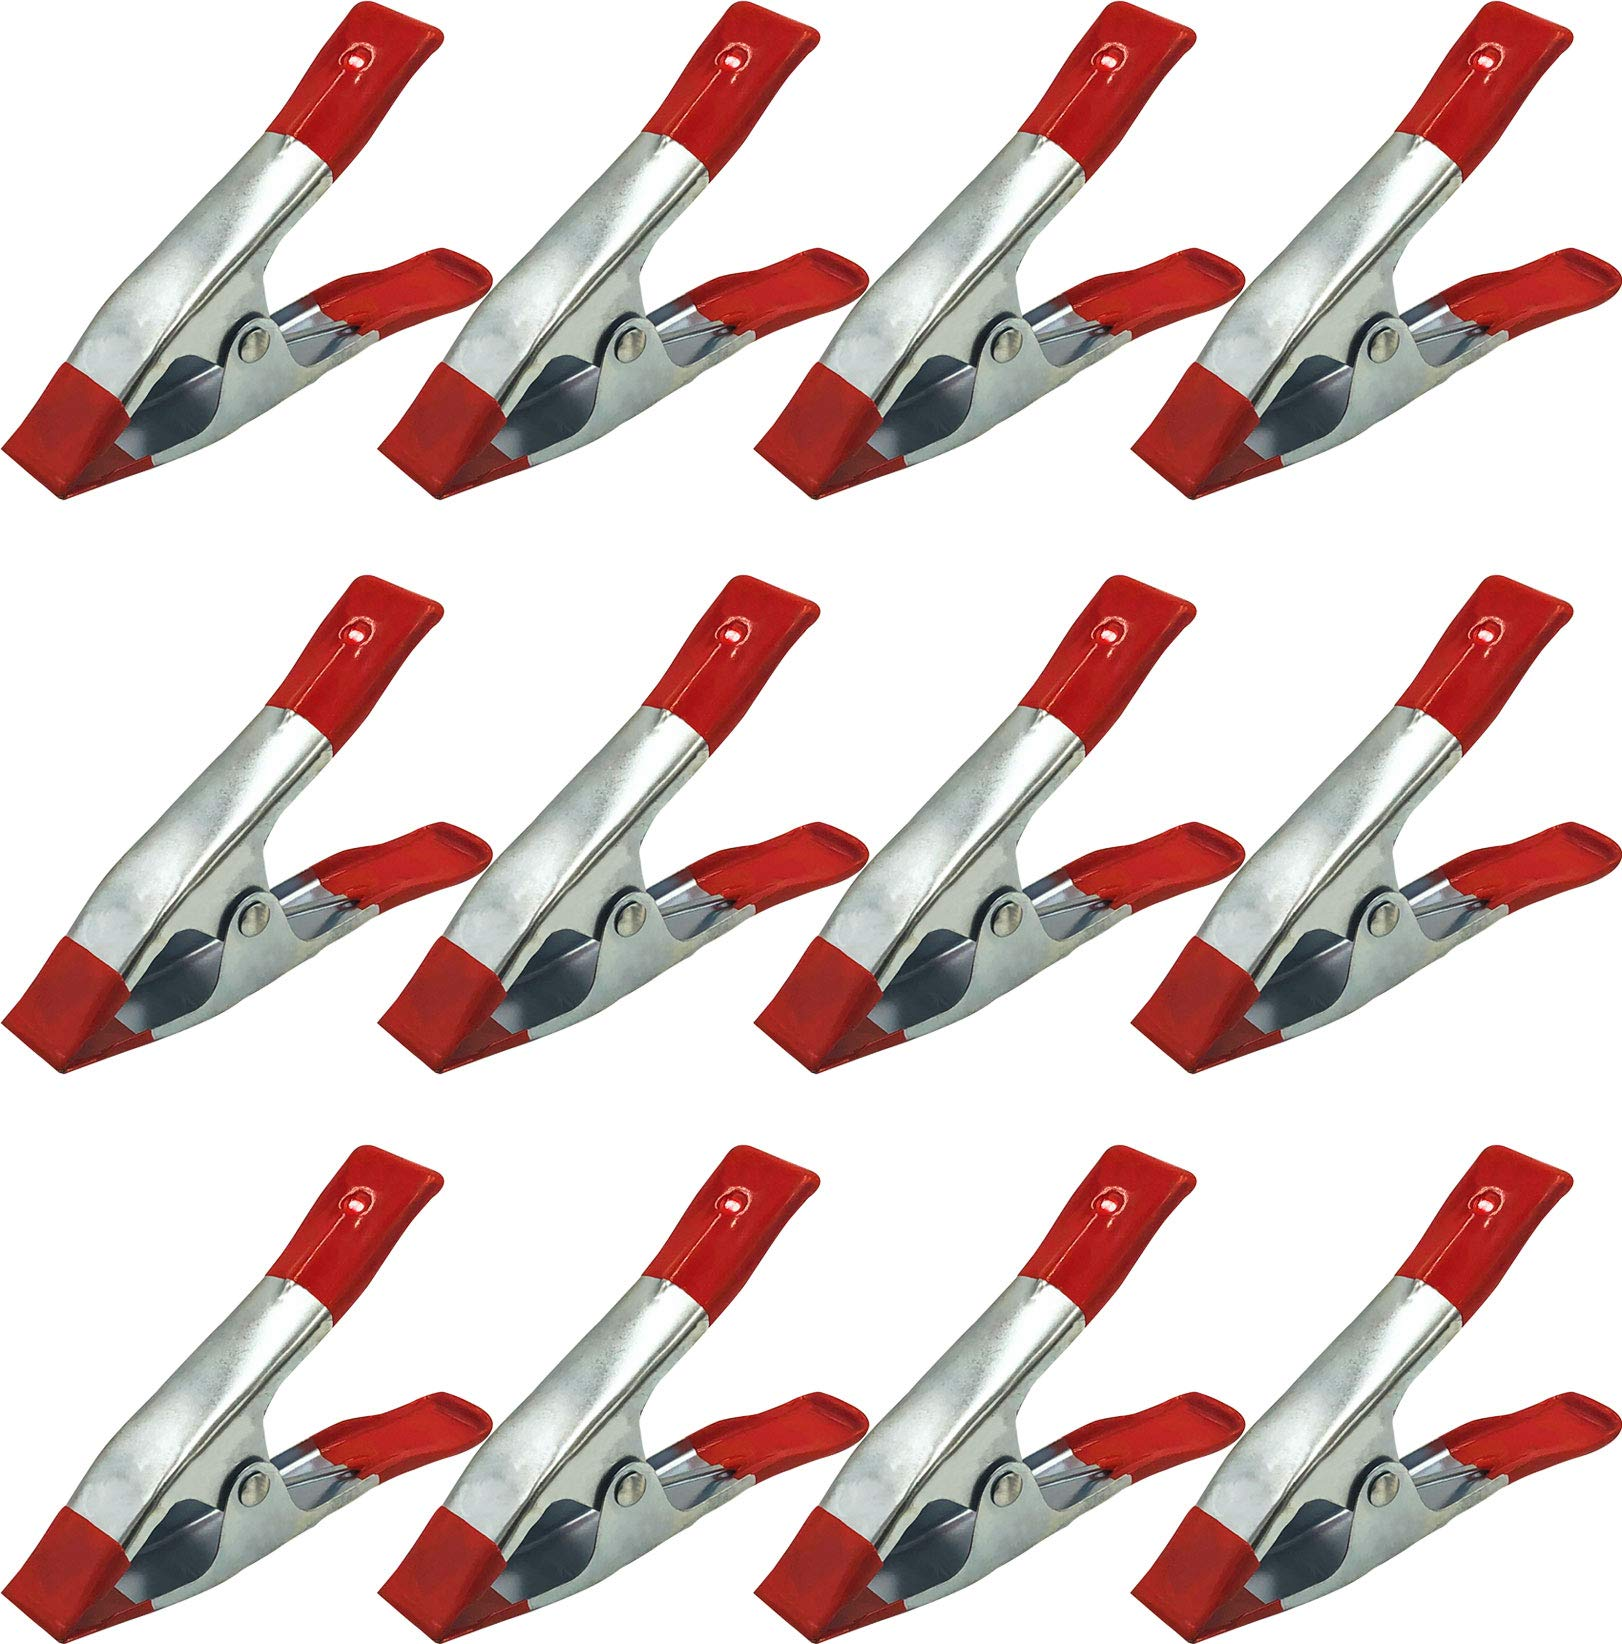 6'' Medium Heavy Duty Spring Clamps (15 Pack) by Papa John's Toolbox